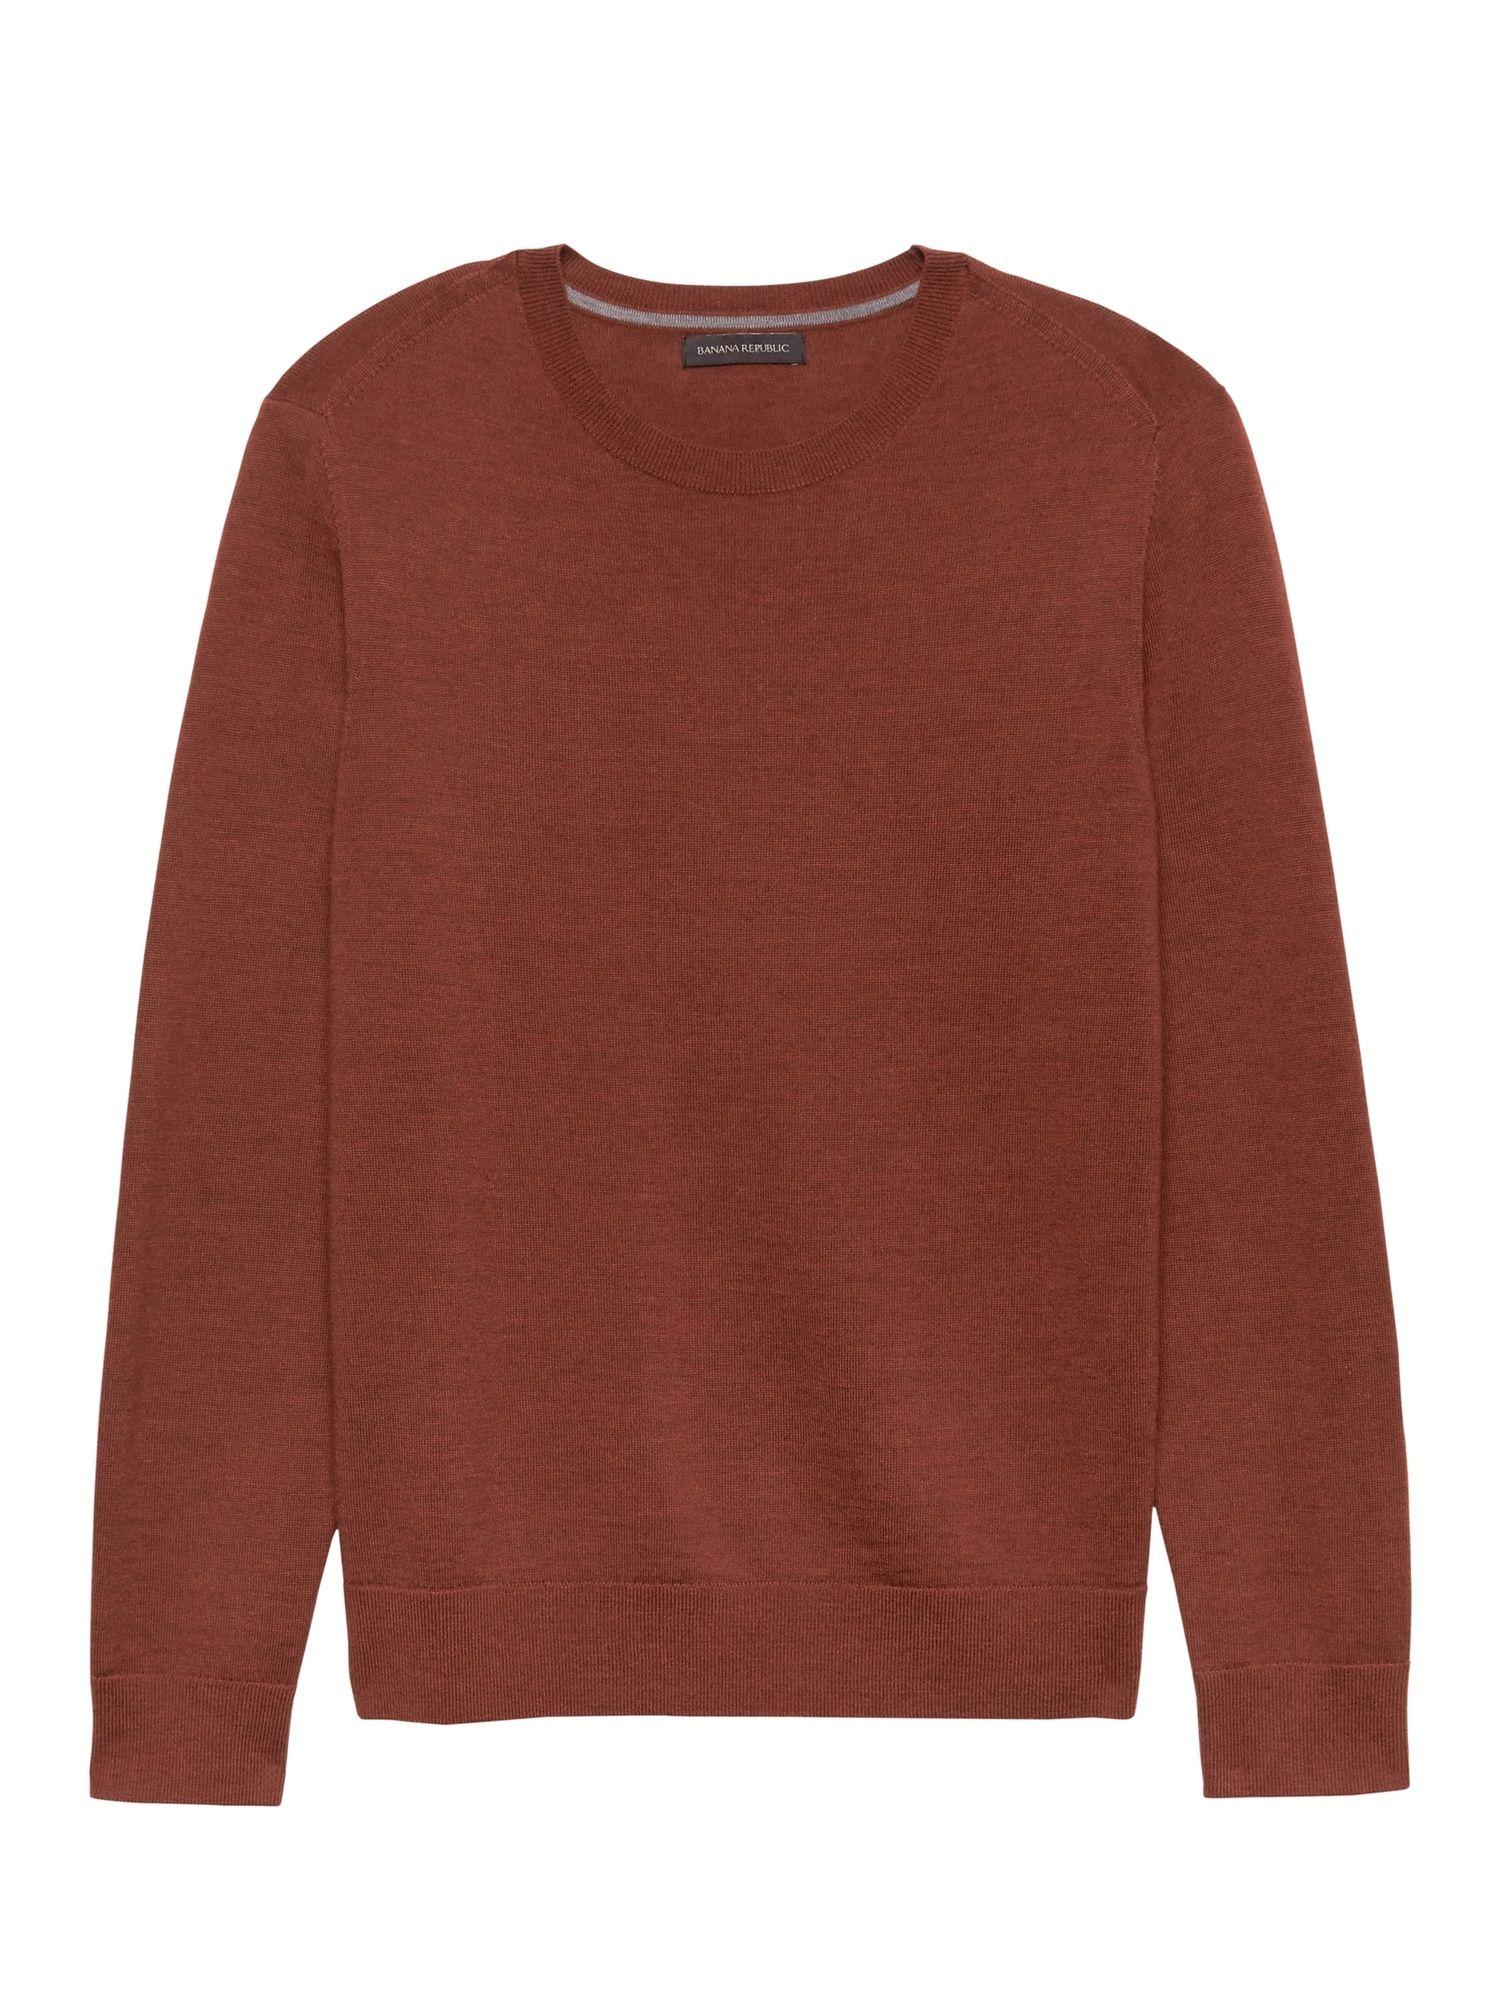 1e0fa6cf Extra-Fine Italian Merino Wool Crew-Neck Sweater   Banana Republic